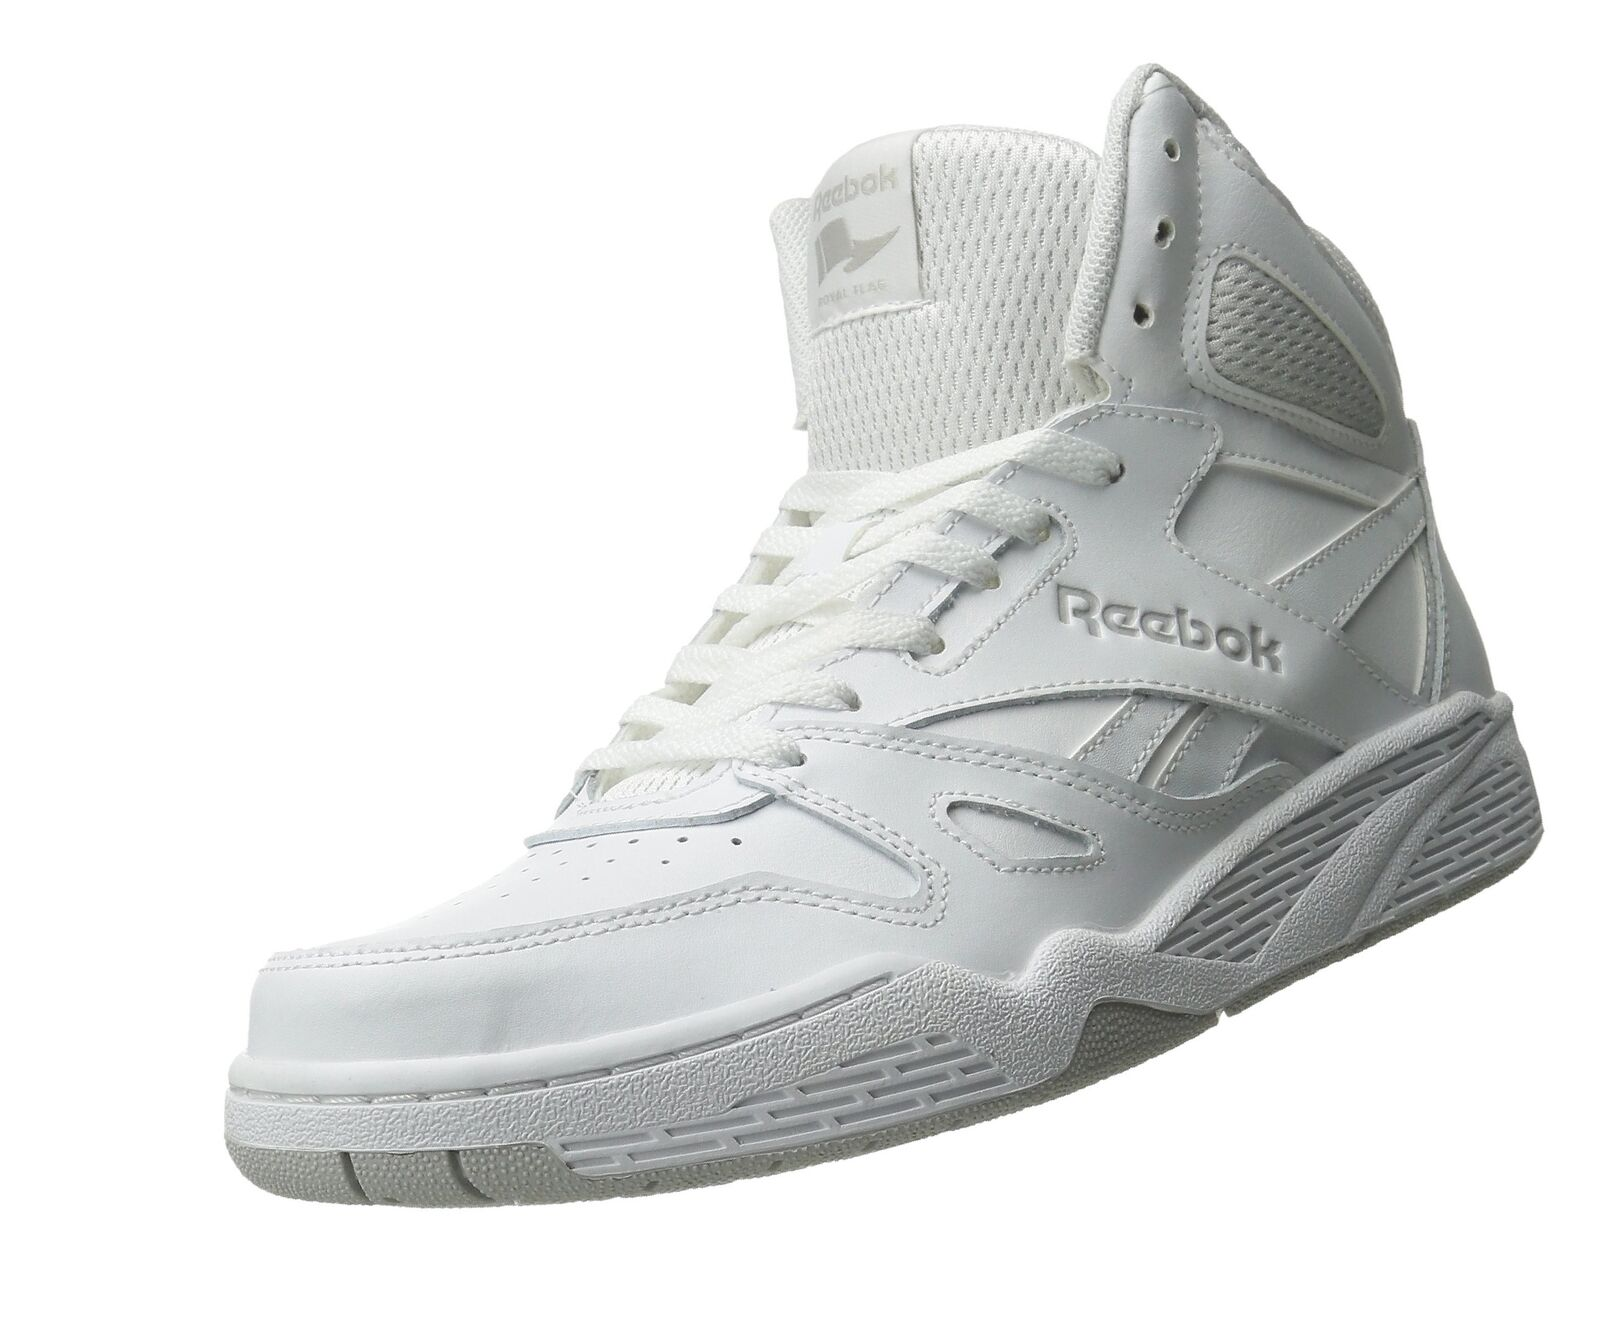 Reebok Men's Royal  Bb4500 Hi Fashion scarpe da ginnastica bianca  Steel 11 M US  fino al 70% di sconto